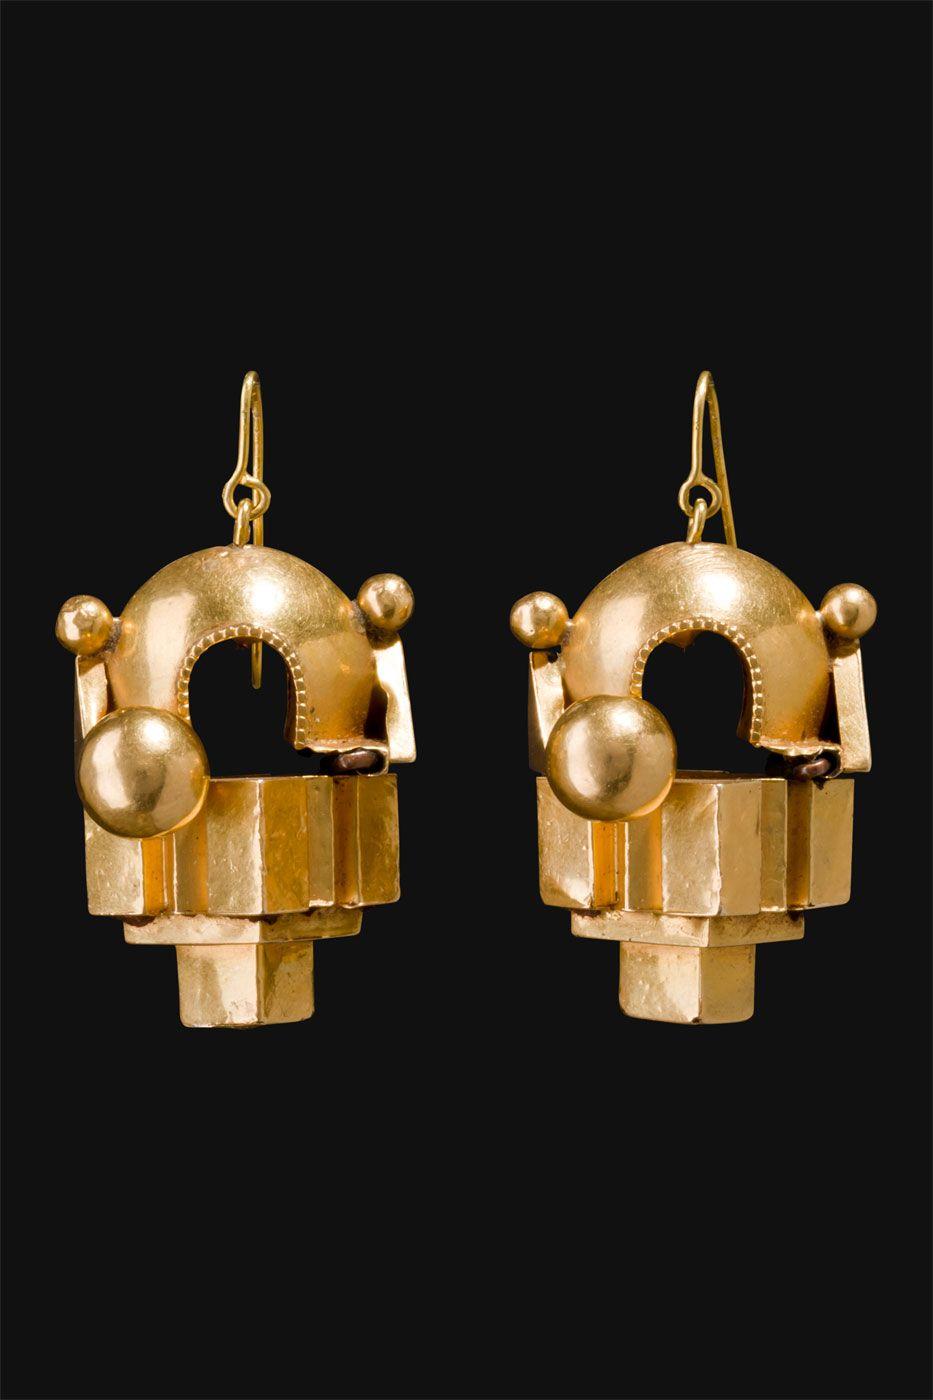 thandatti earrings tamil nadu, south india first half 1900  herren schmuck ohrringe c 82_87 #1